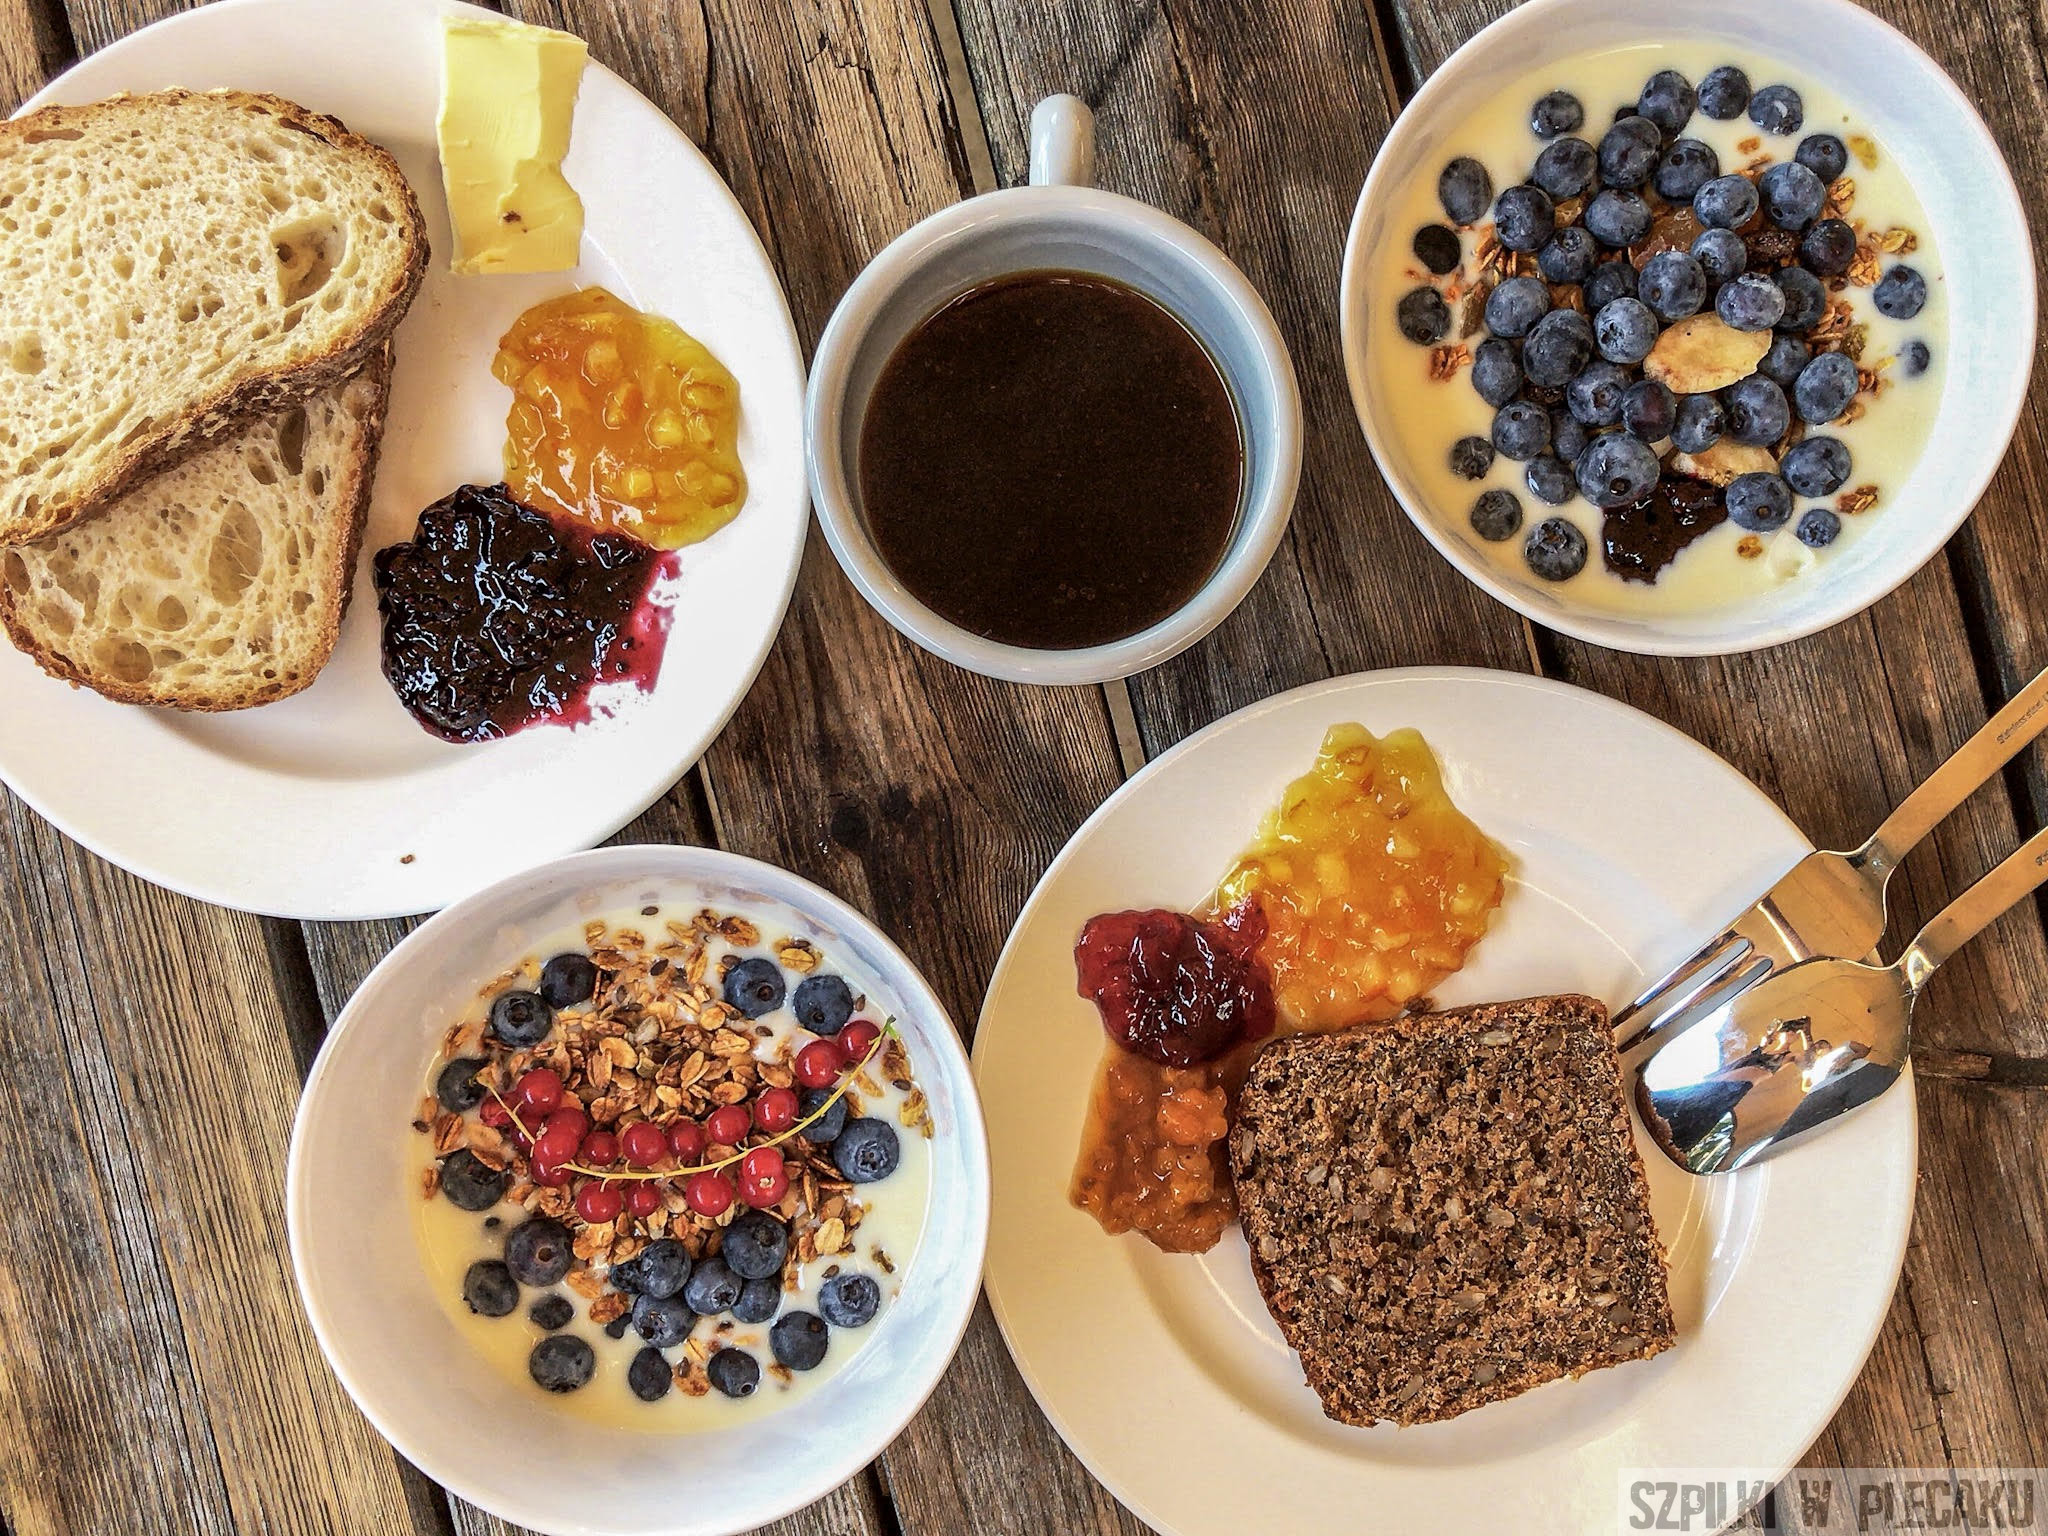 #gobackpack camp - Szpilki w plecaku - breakfast